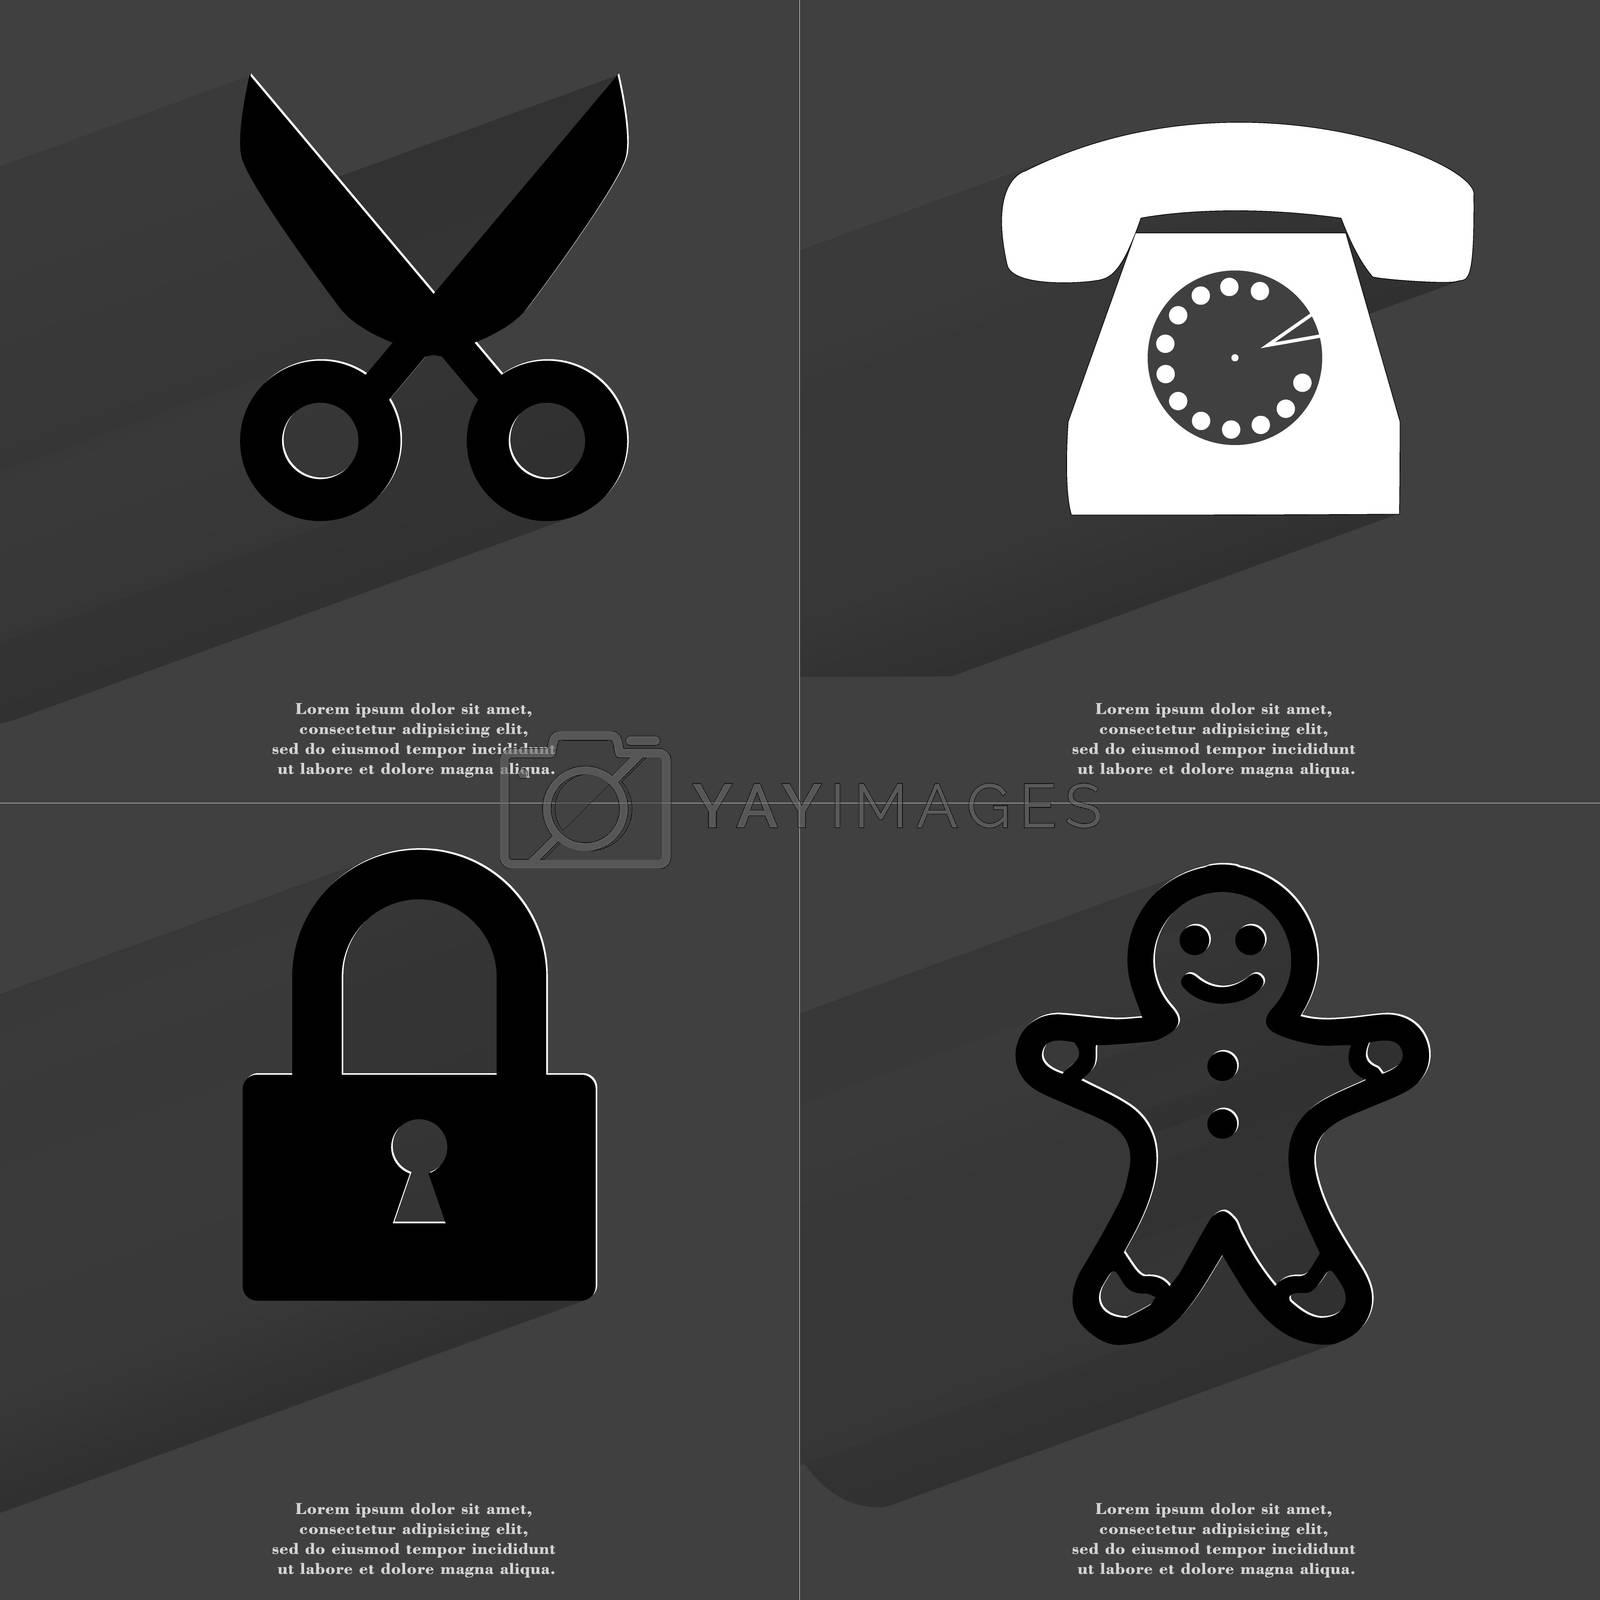 Royalty free image of Scissors, Retro phone, Lock, Gingerbread man. Symbols with long shadow. Flat design by serhii_lohvyniuk